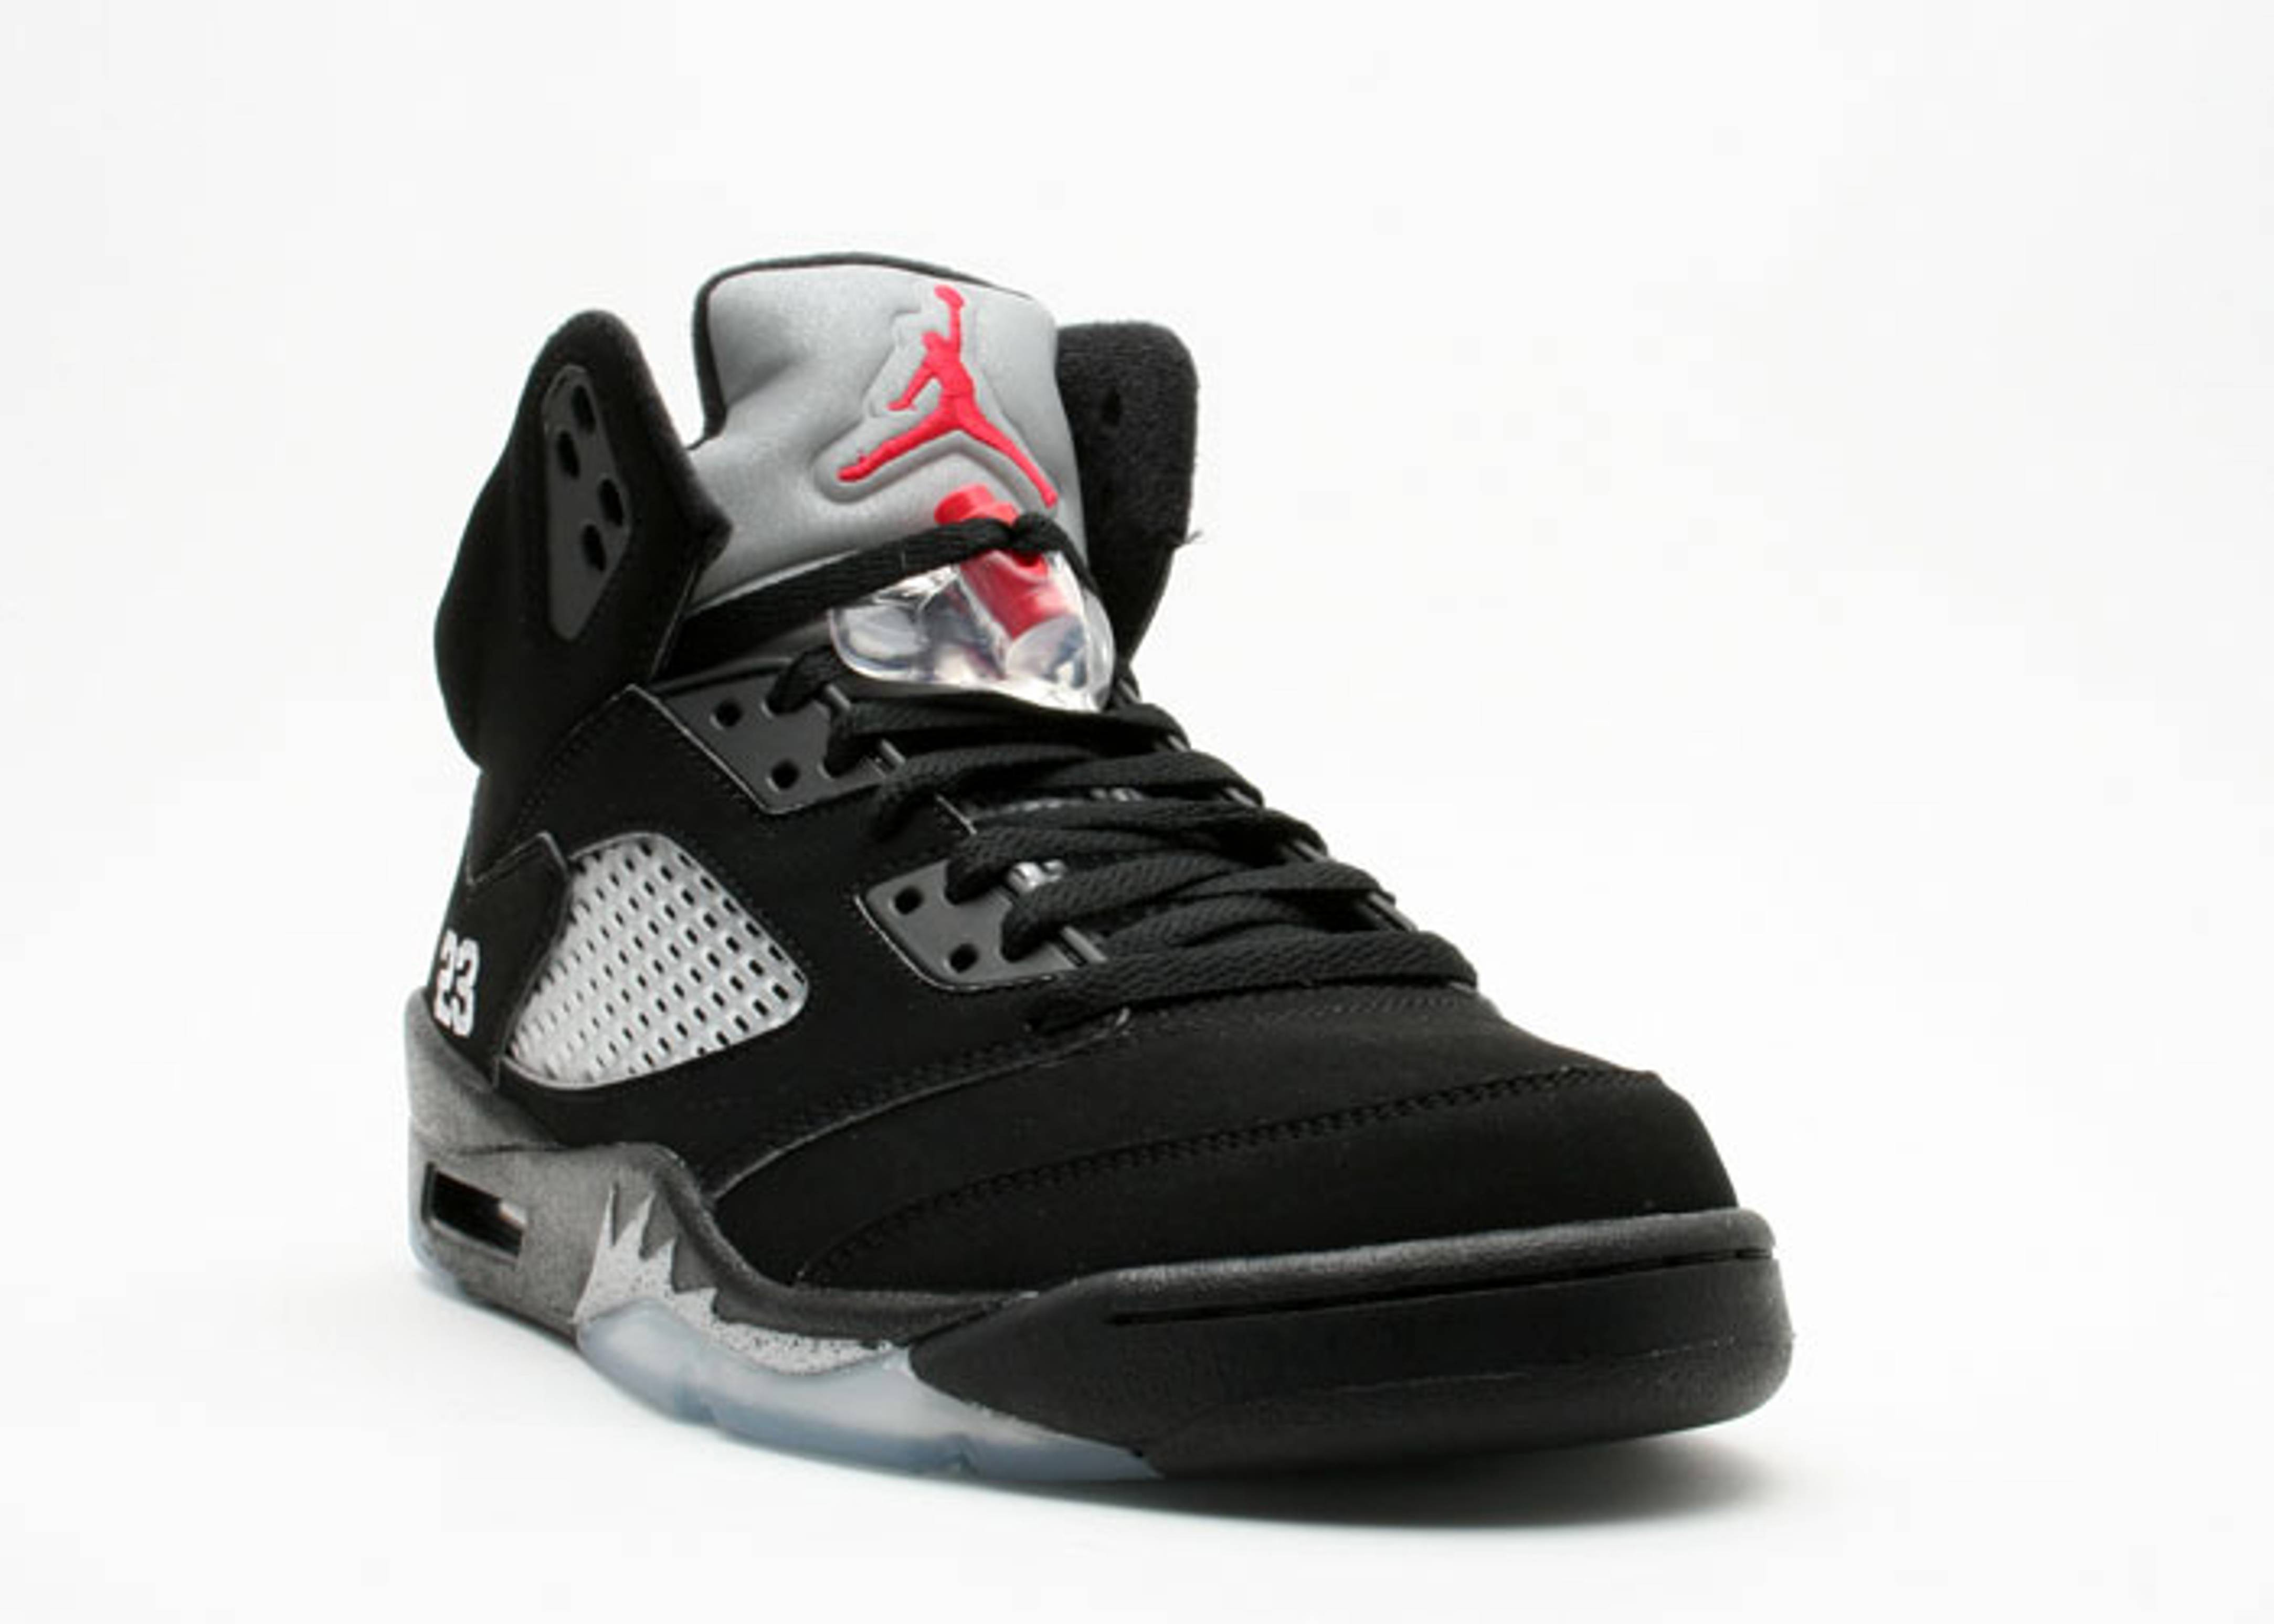 Jordan 5 Metallic